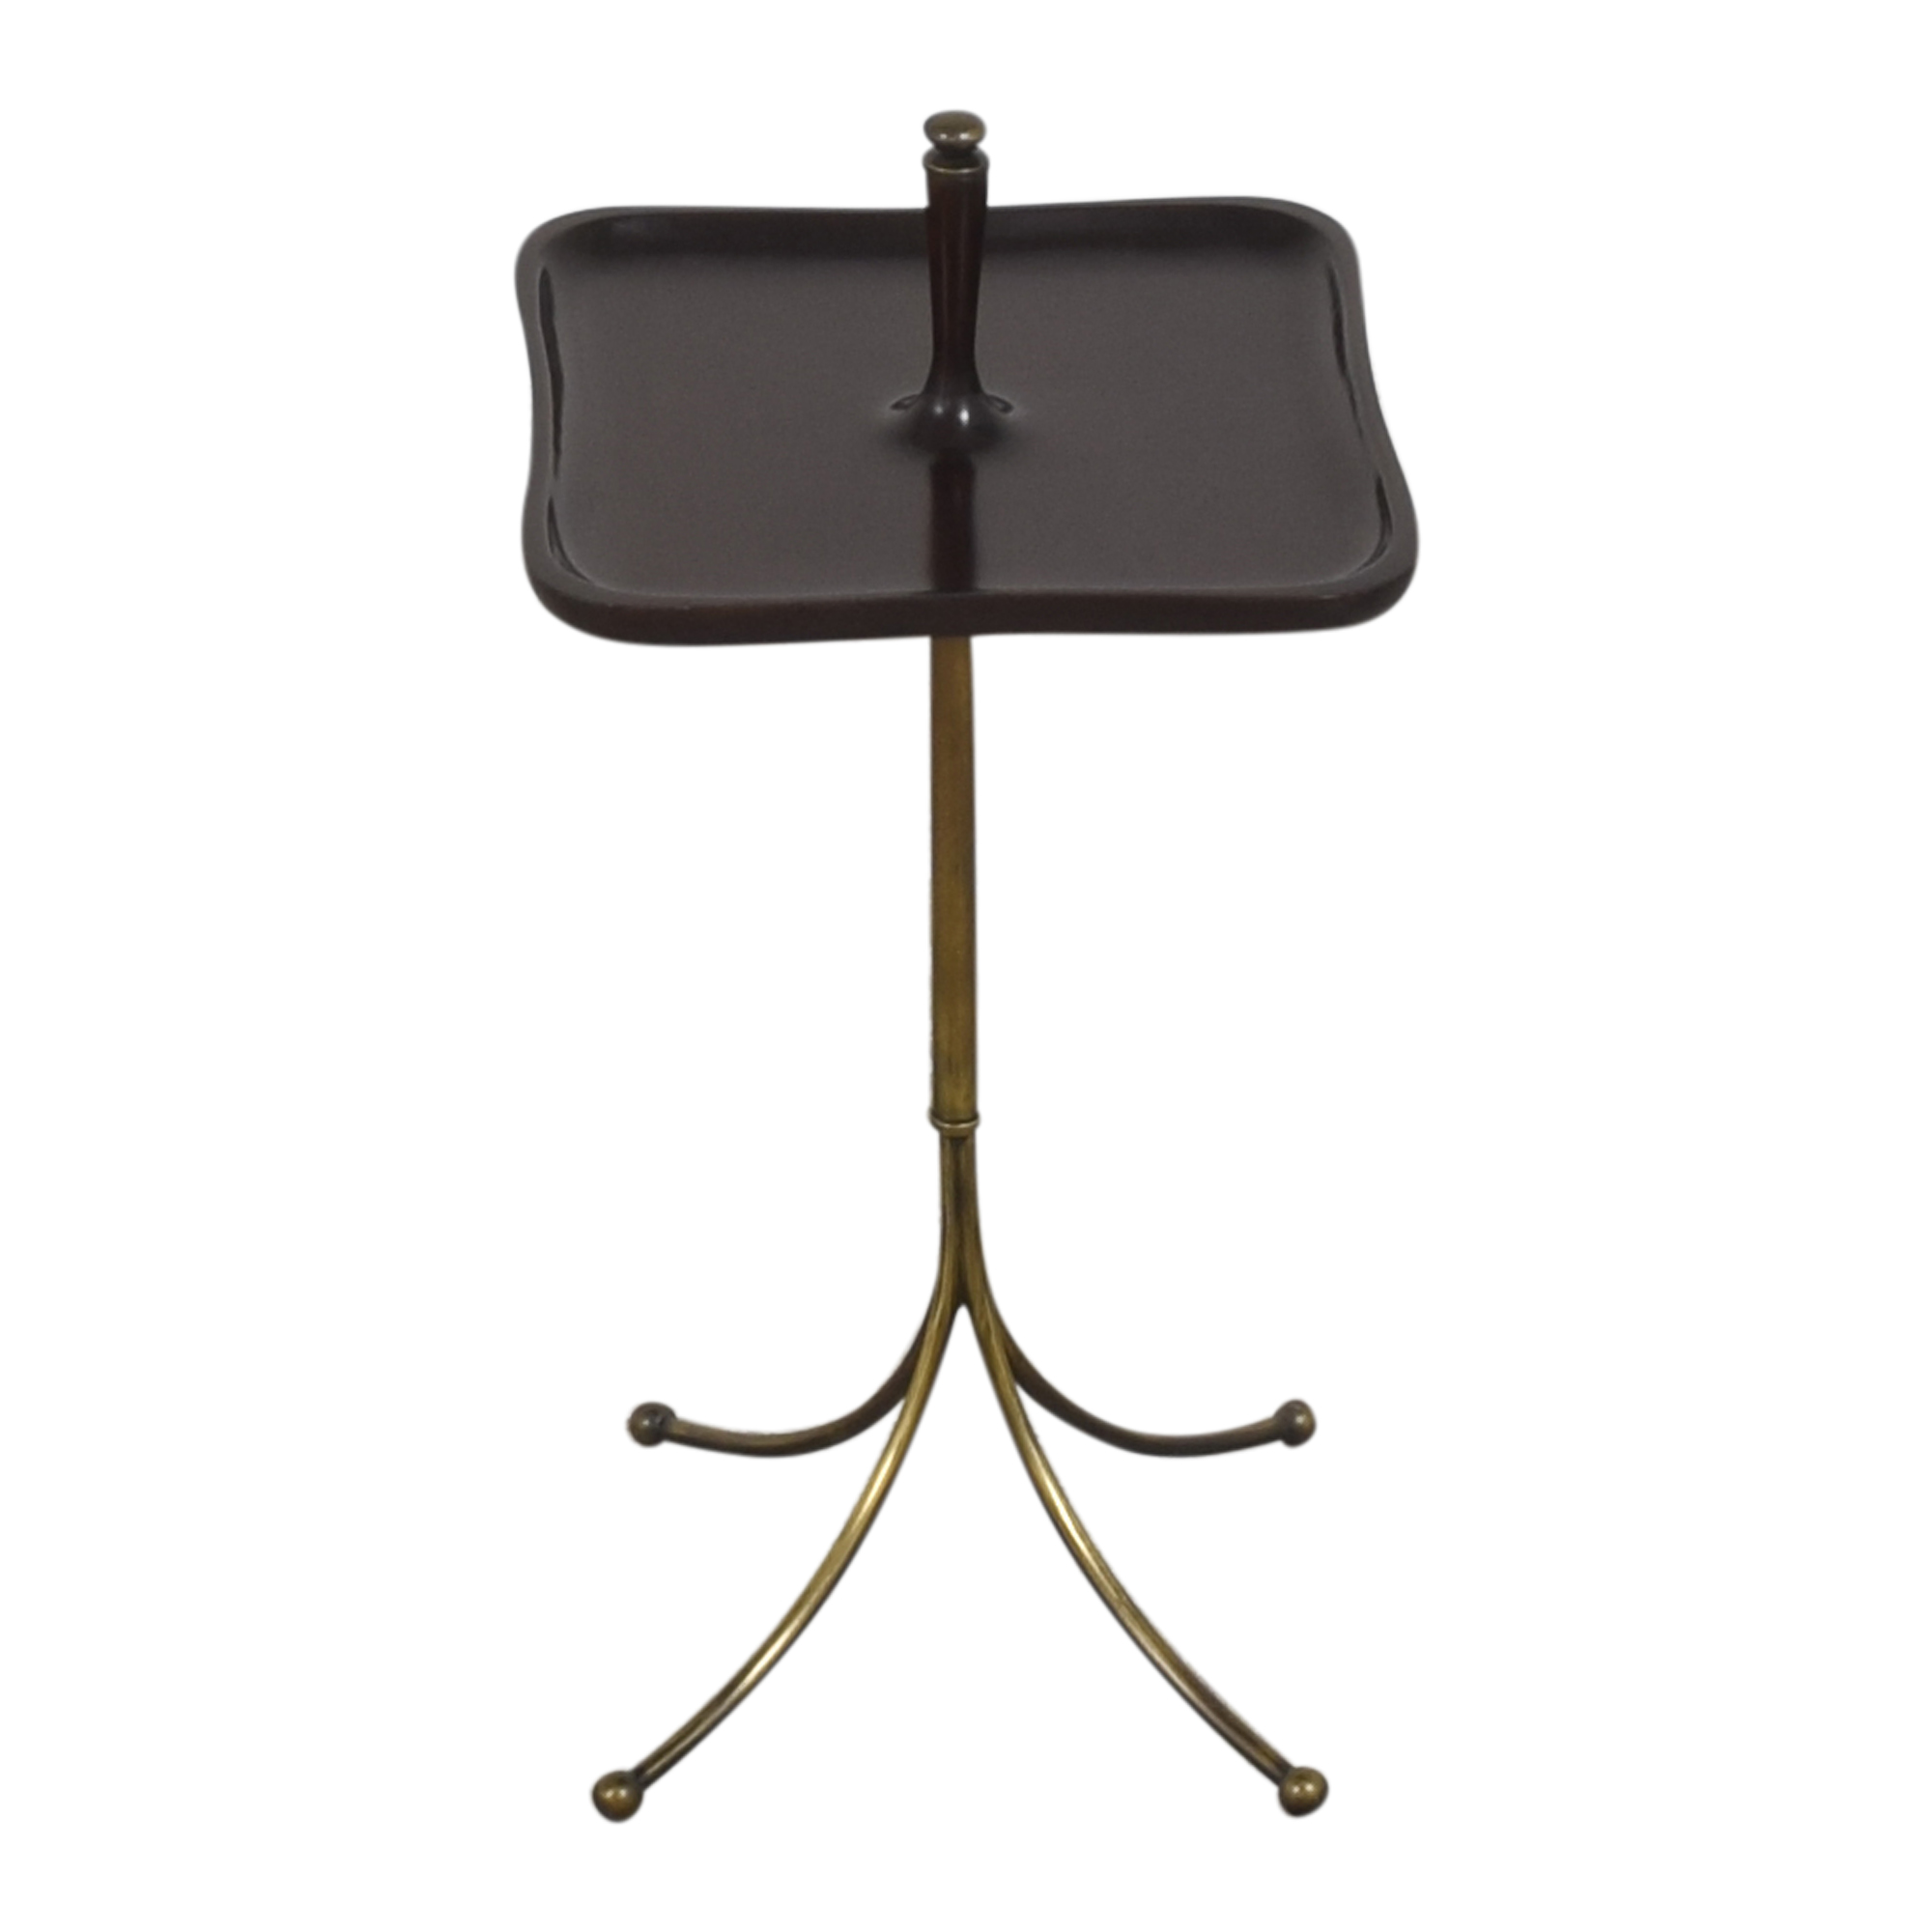 Thomas O'Brien for Century Furniture Casper Table / Tables